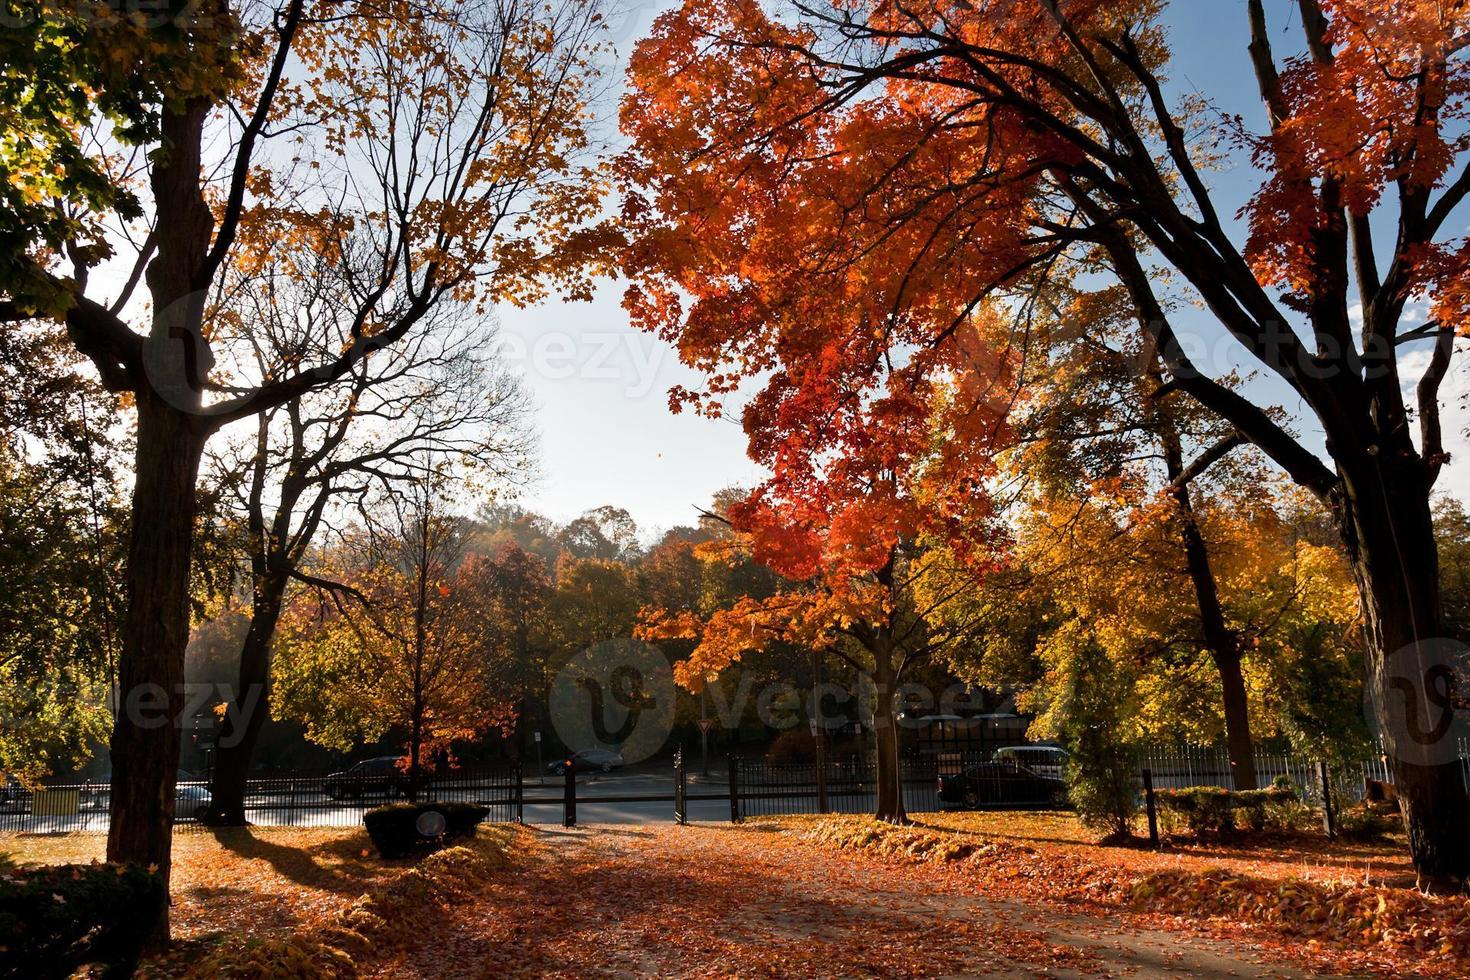 patio trasero de otoño foto